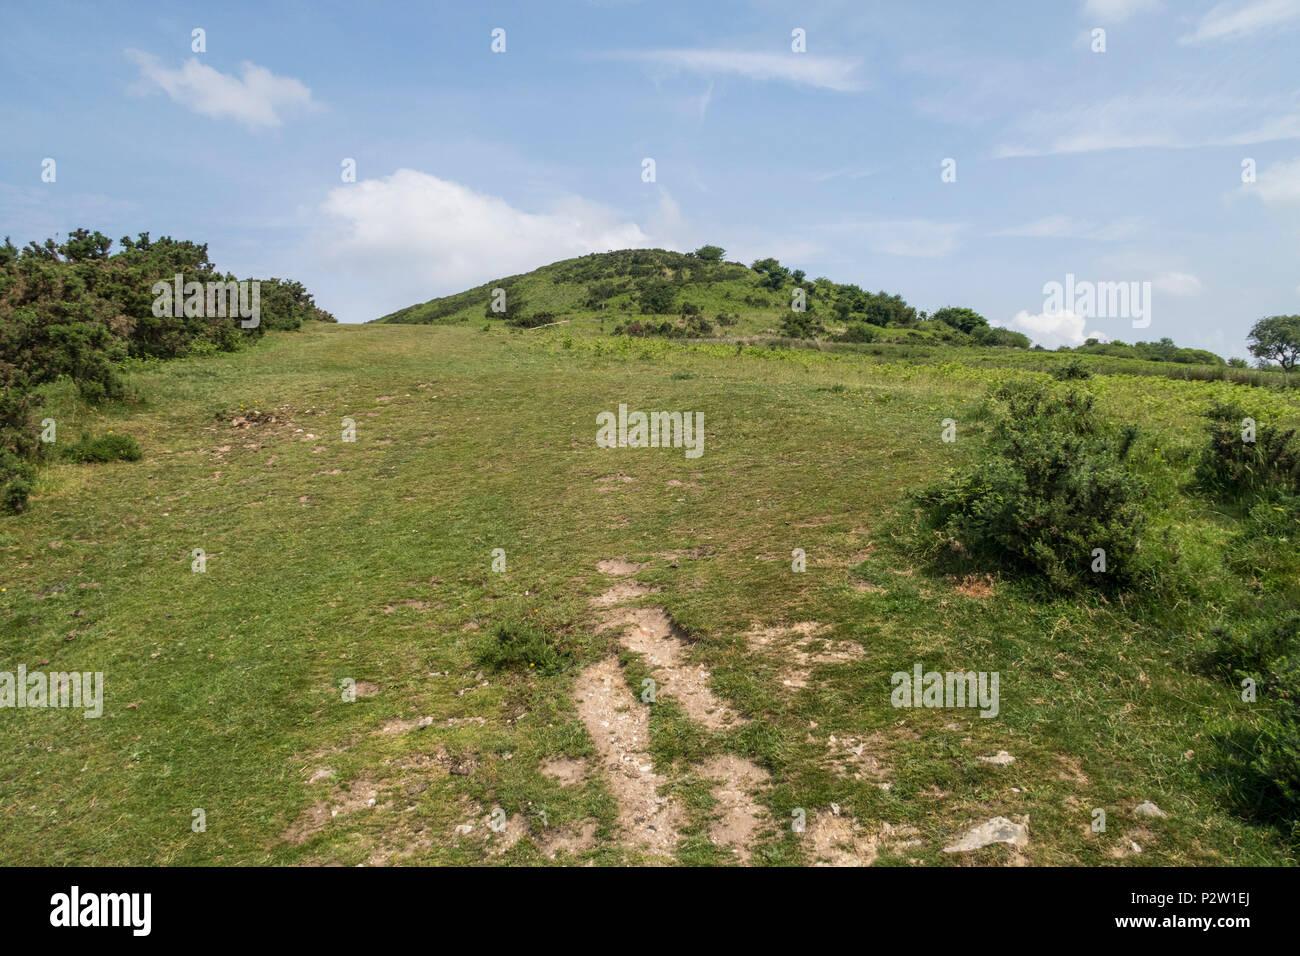 Pilsdon Pen, an iron age multivallate Durotrigian hill fort in the Marshwood Vale, Dorset. - Stock Image